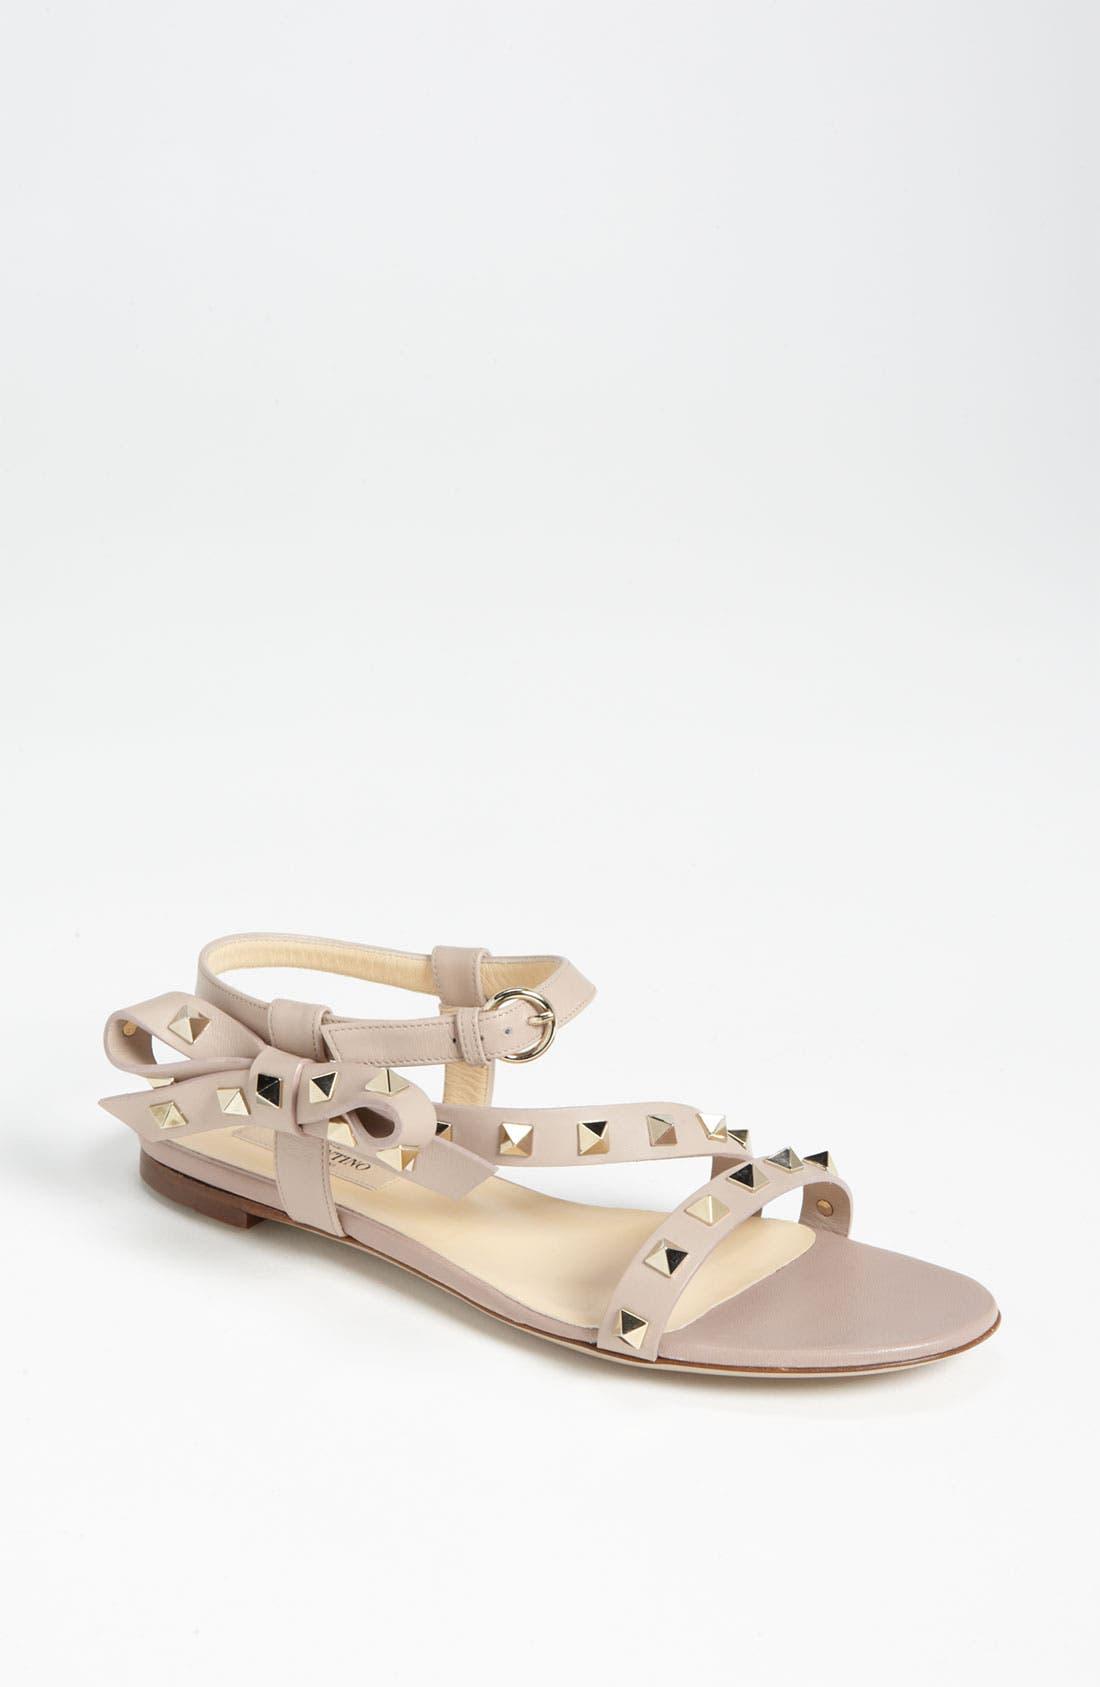 Alternate Image 1 Selected - Valentino 'Rockstud' Bow Flat Sandal